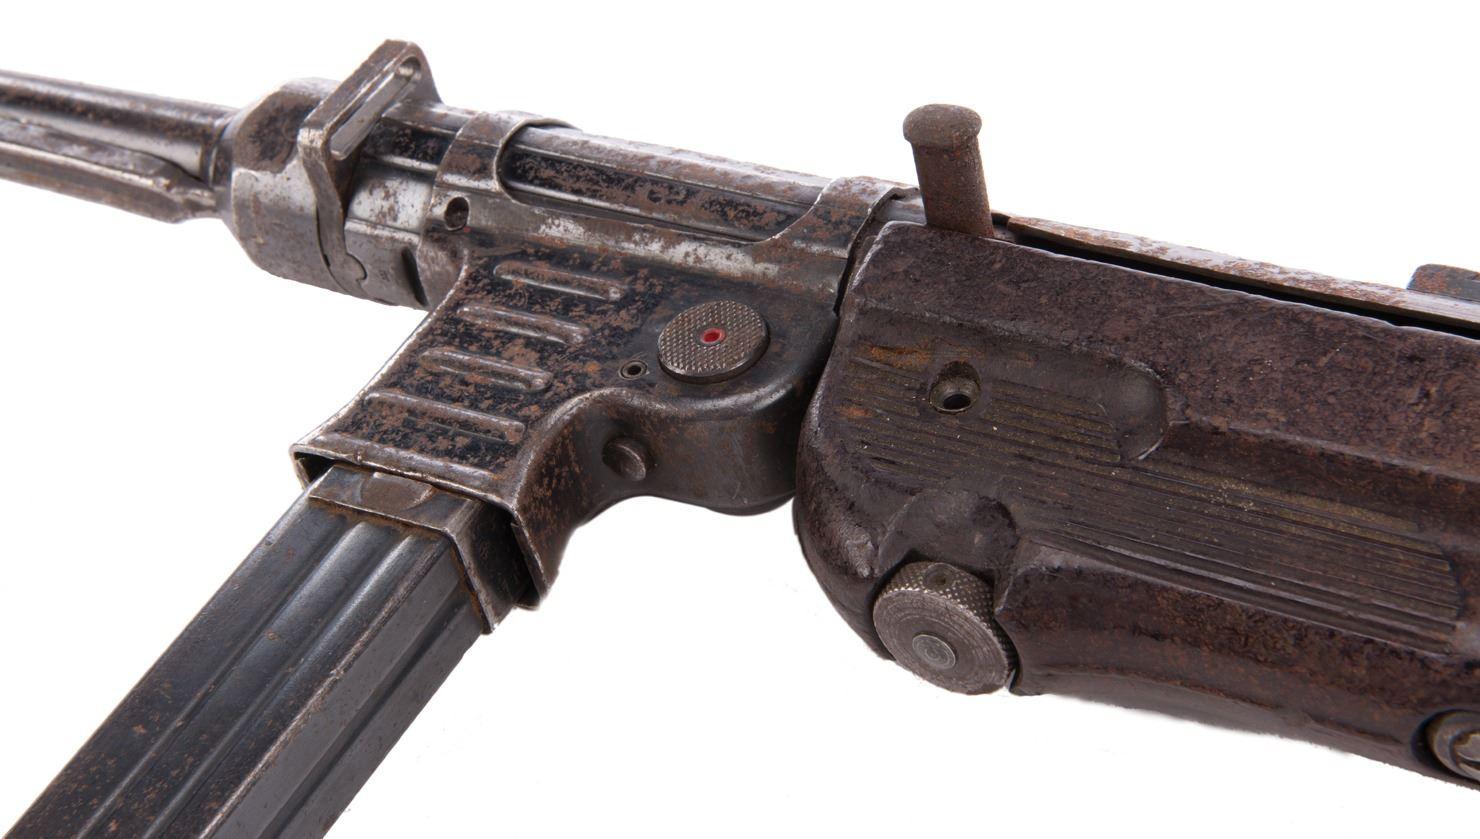 "Richard Burton ""Major Smith"" MP40 submachine gun from Where Eagles Dare"